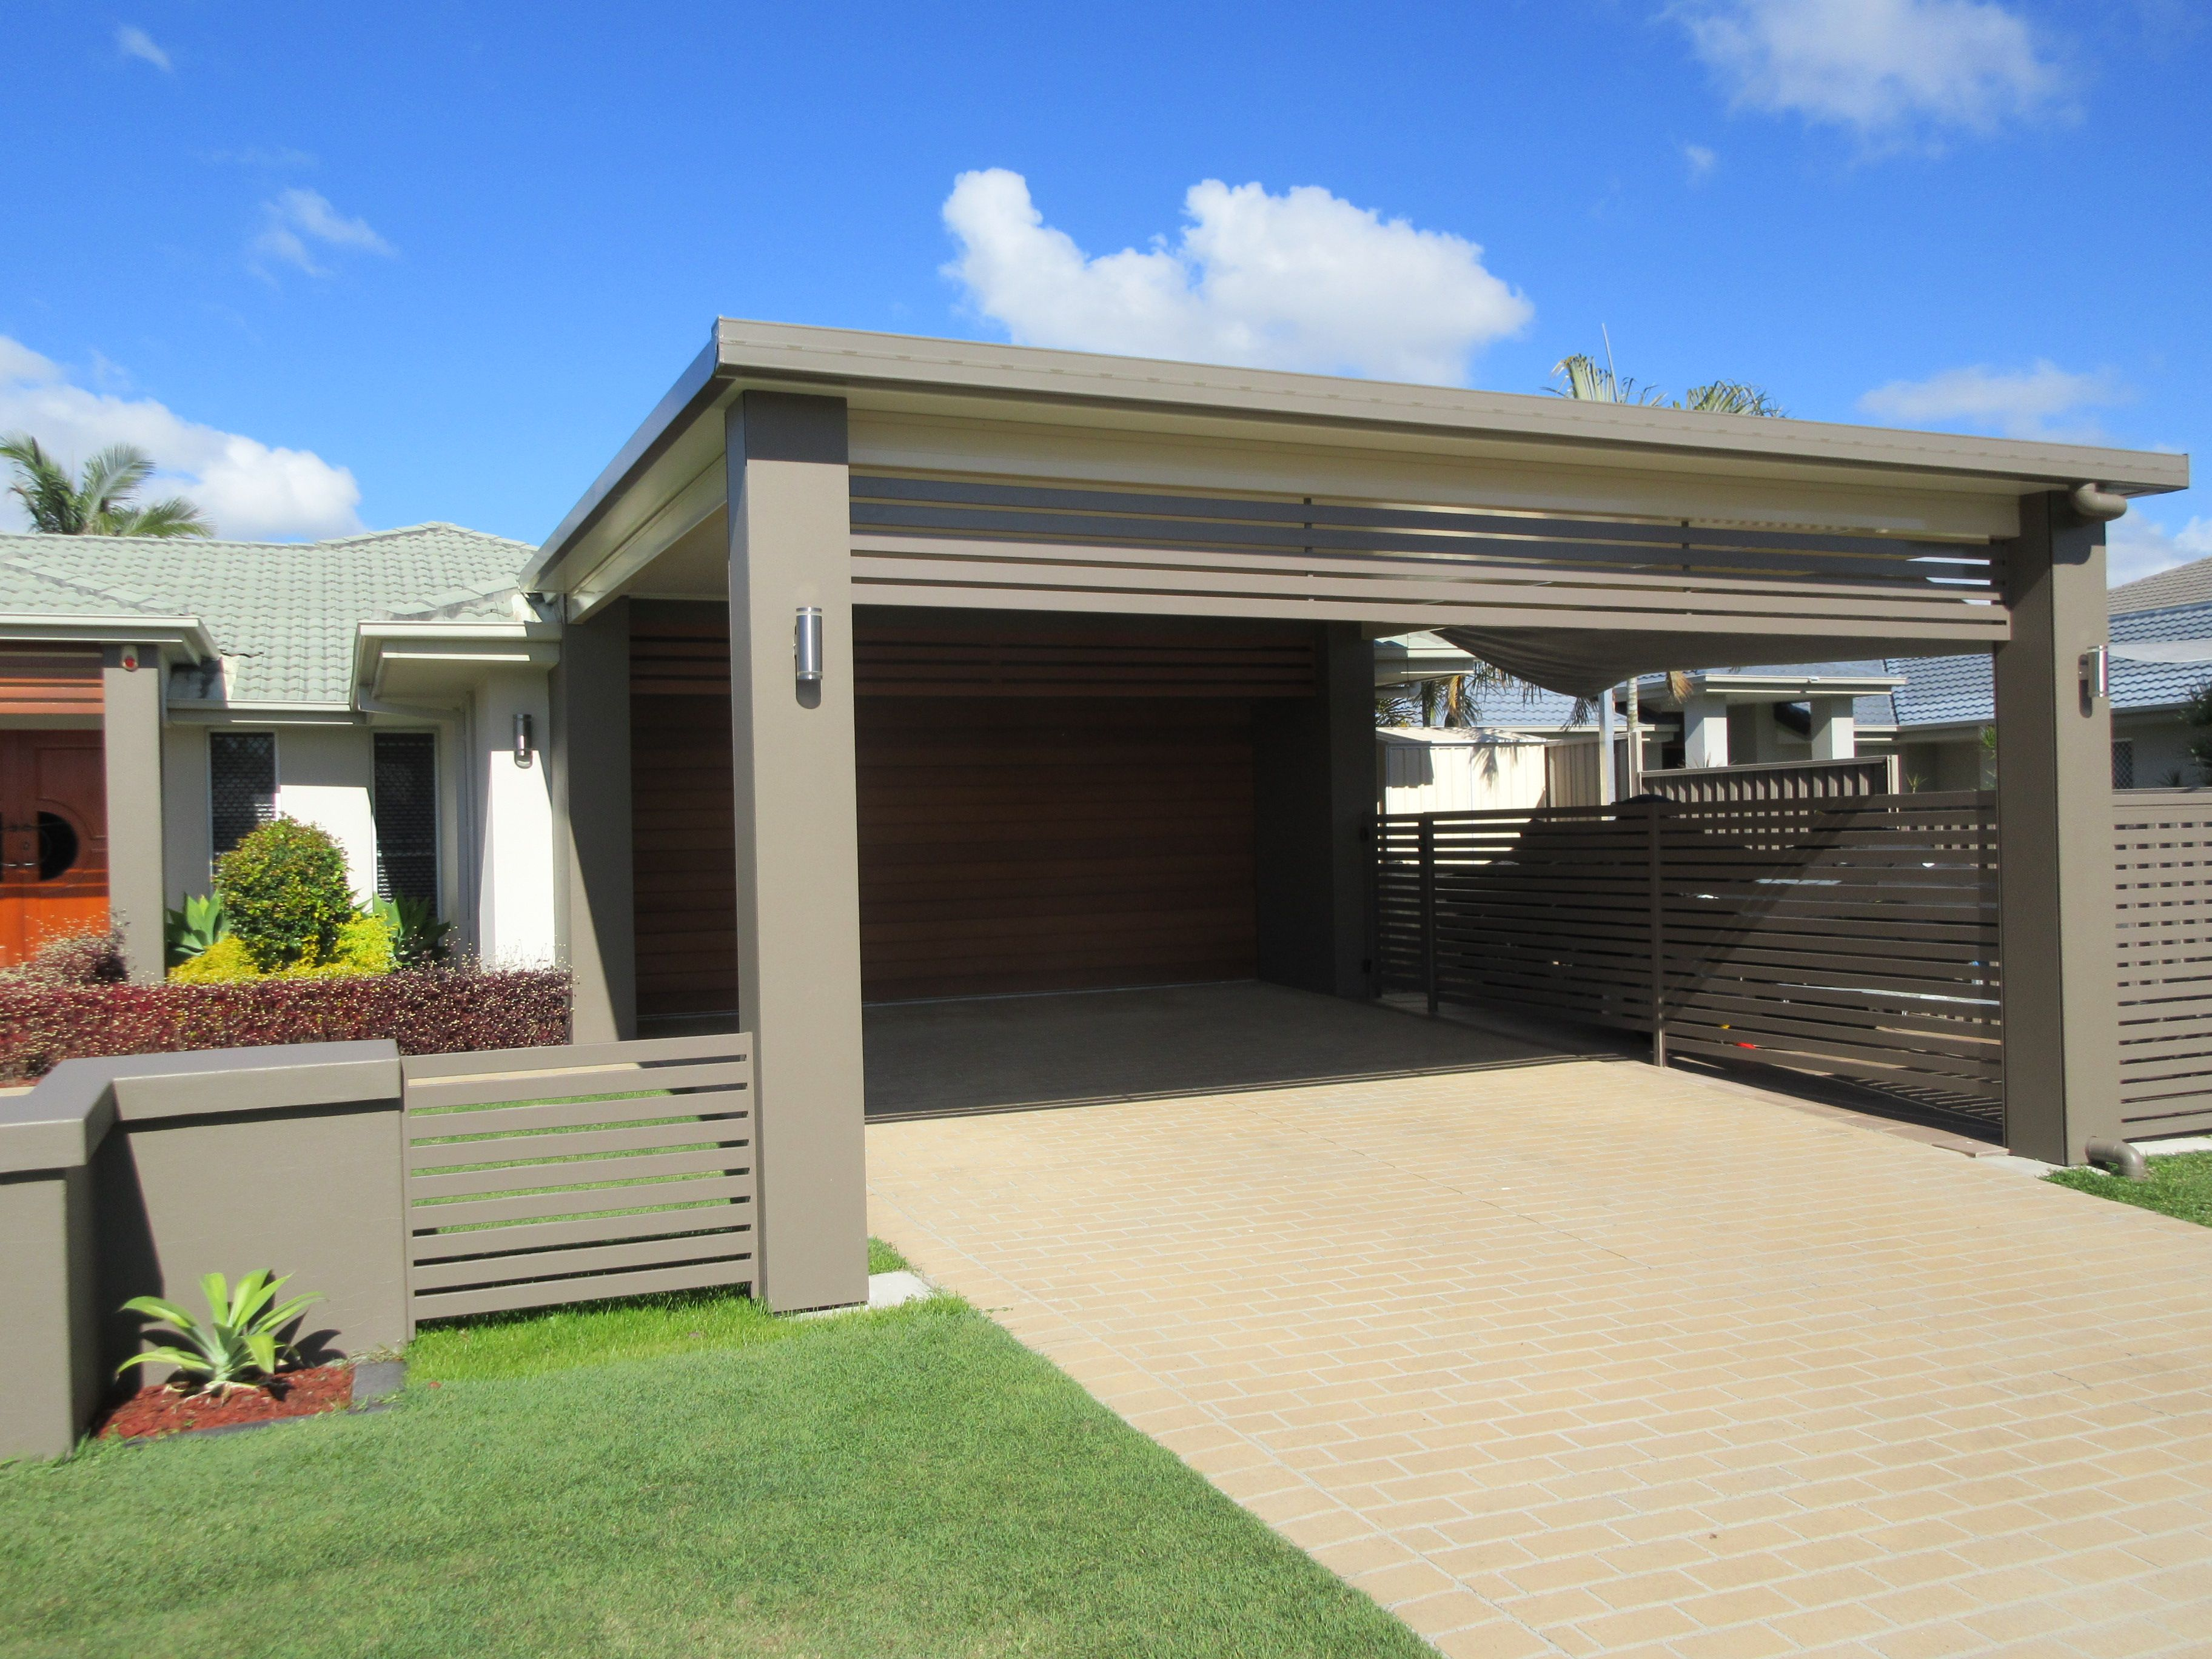 Pin By Vicki Devaux On Home Ideas Carport Designs Carport House Exterior